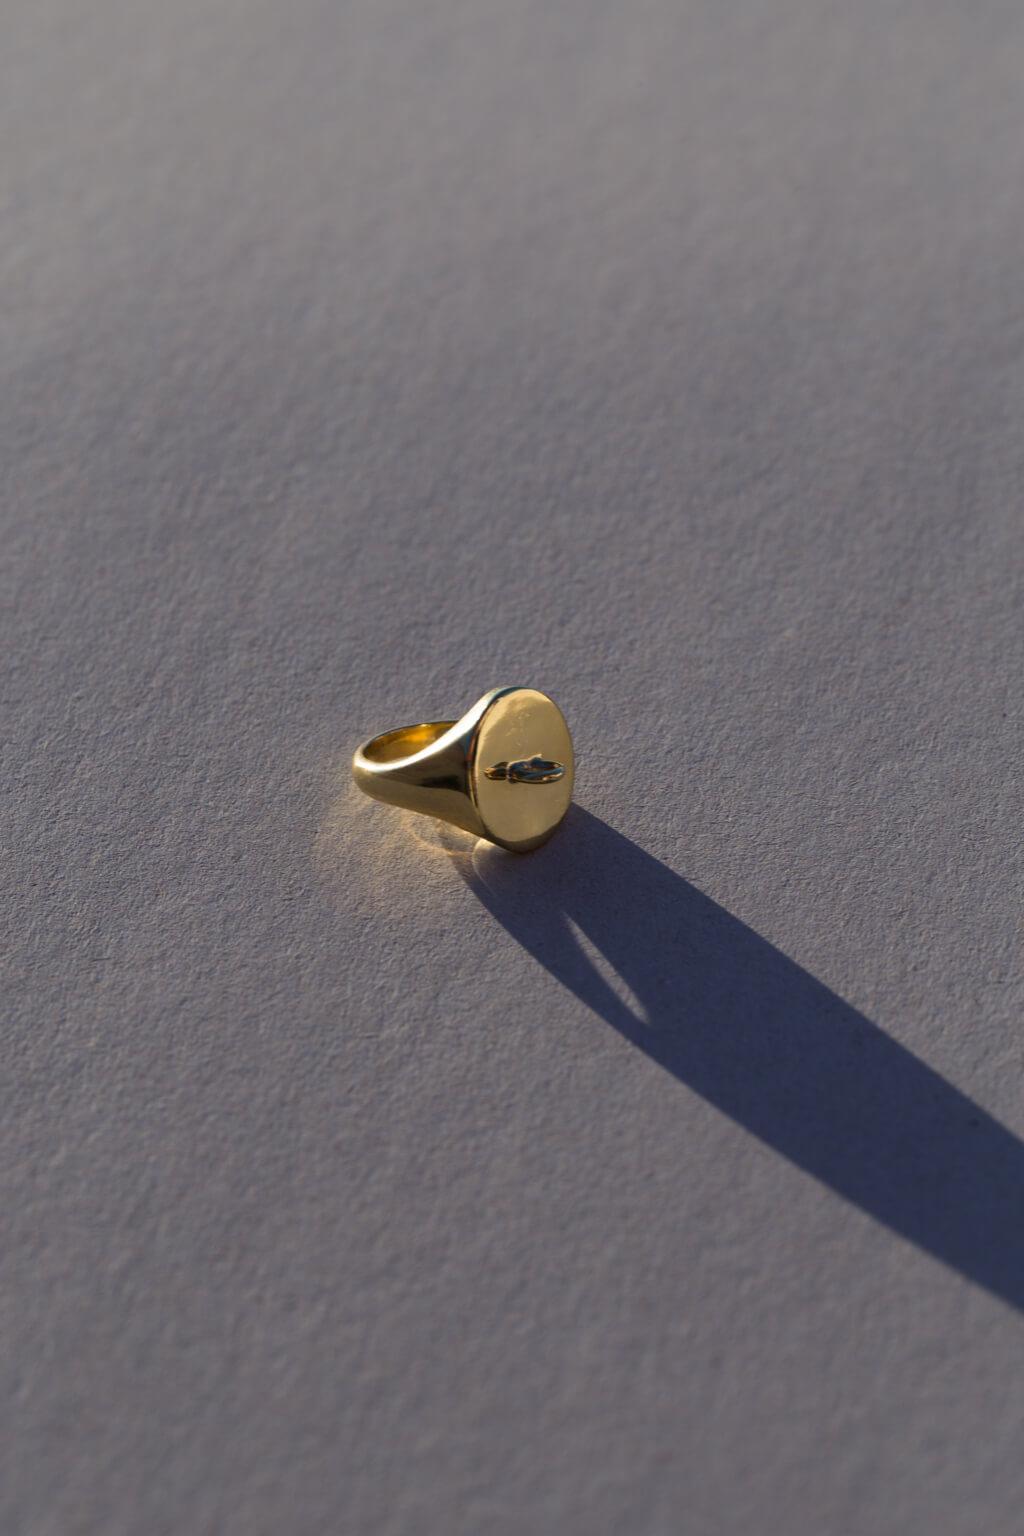 the-link-signet-ring-by-glenda-lopez-alta